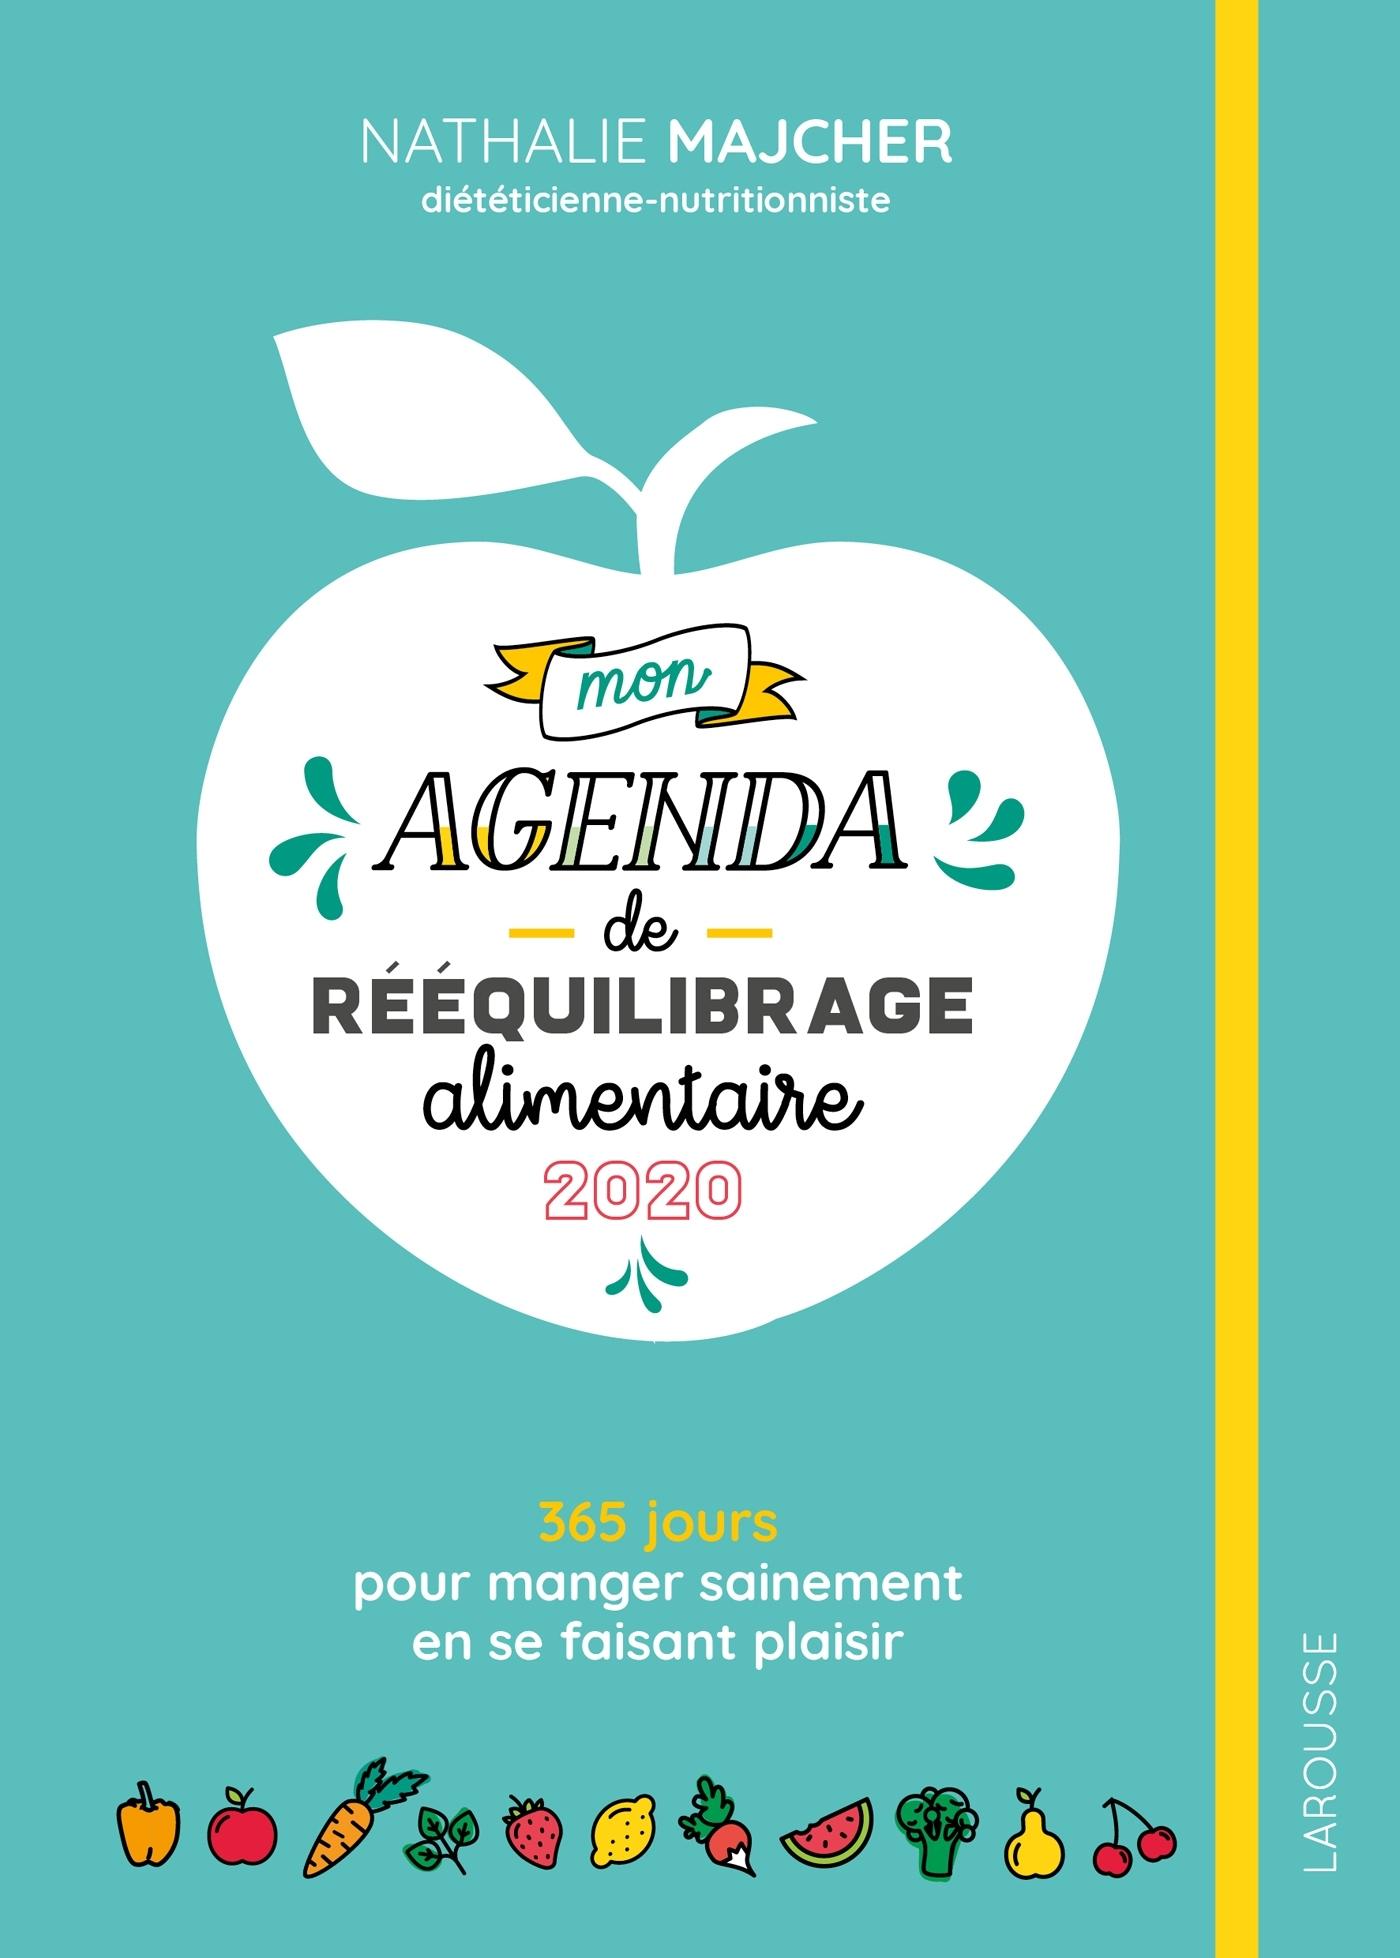 MON AGENDA DE REEQUILIBRAGE ALIMENTAIRE